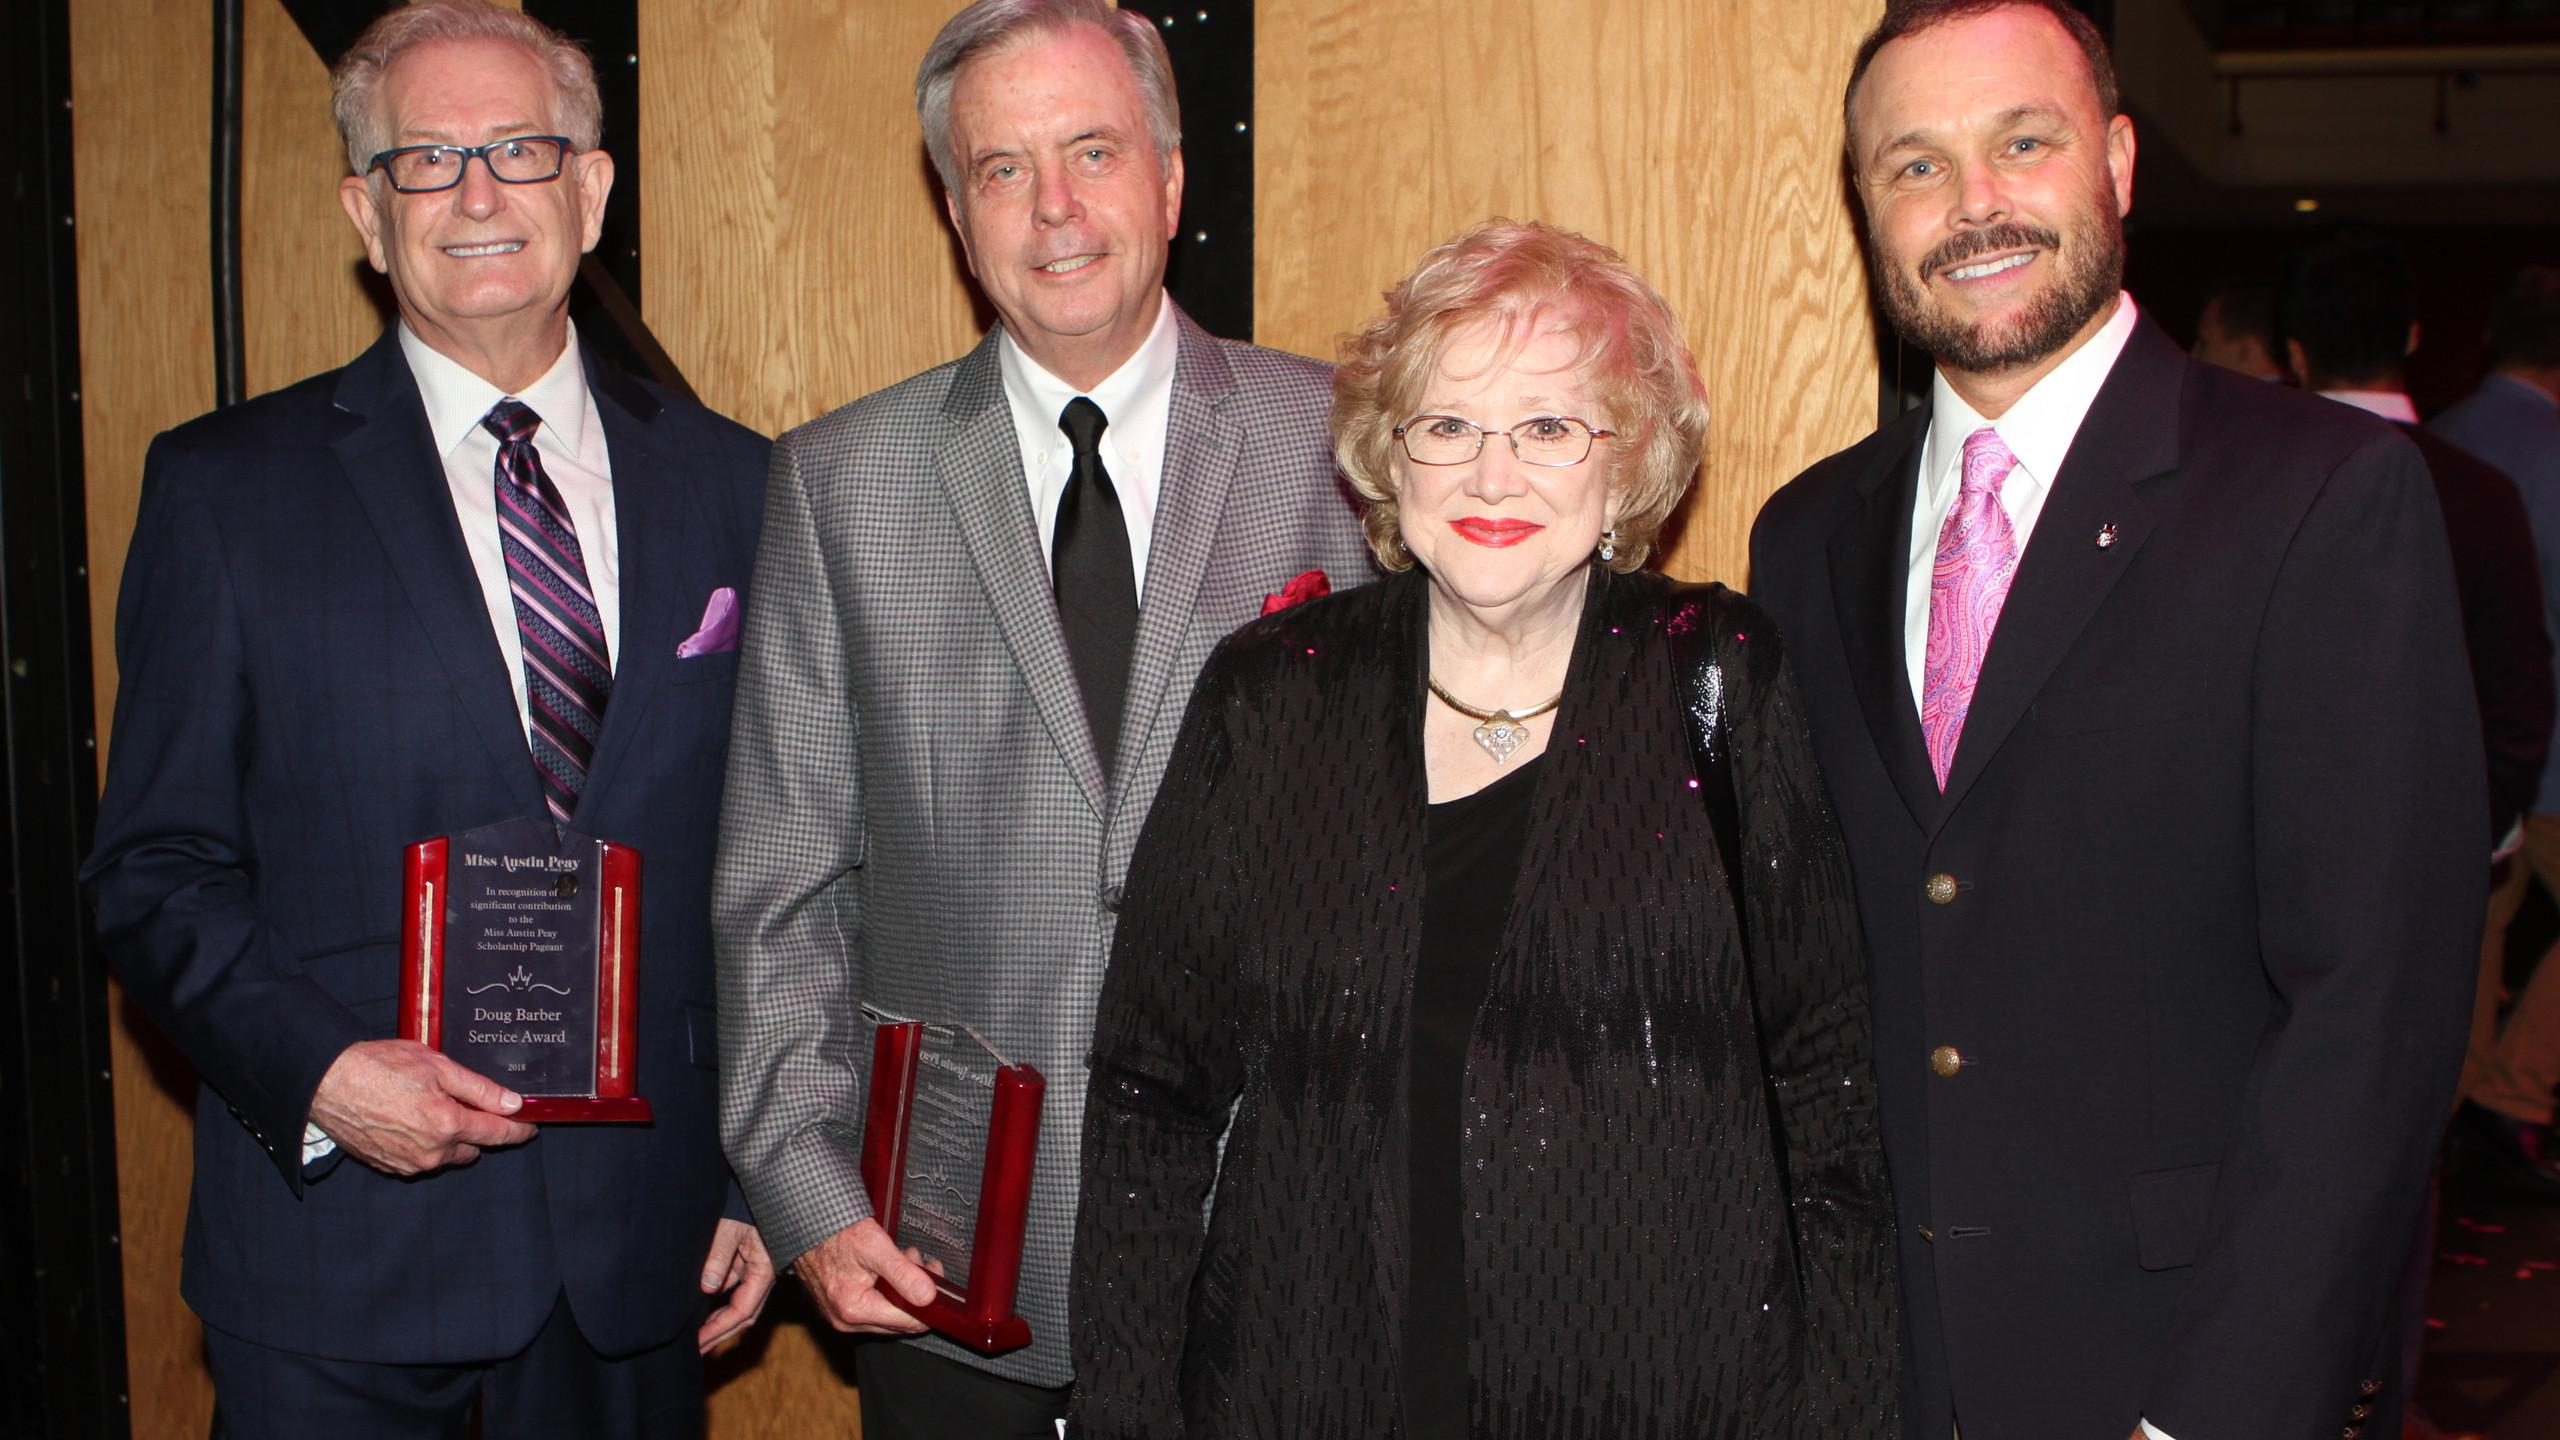 Doug Barber, Fred Landis, Marilyn Hand,